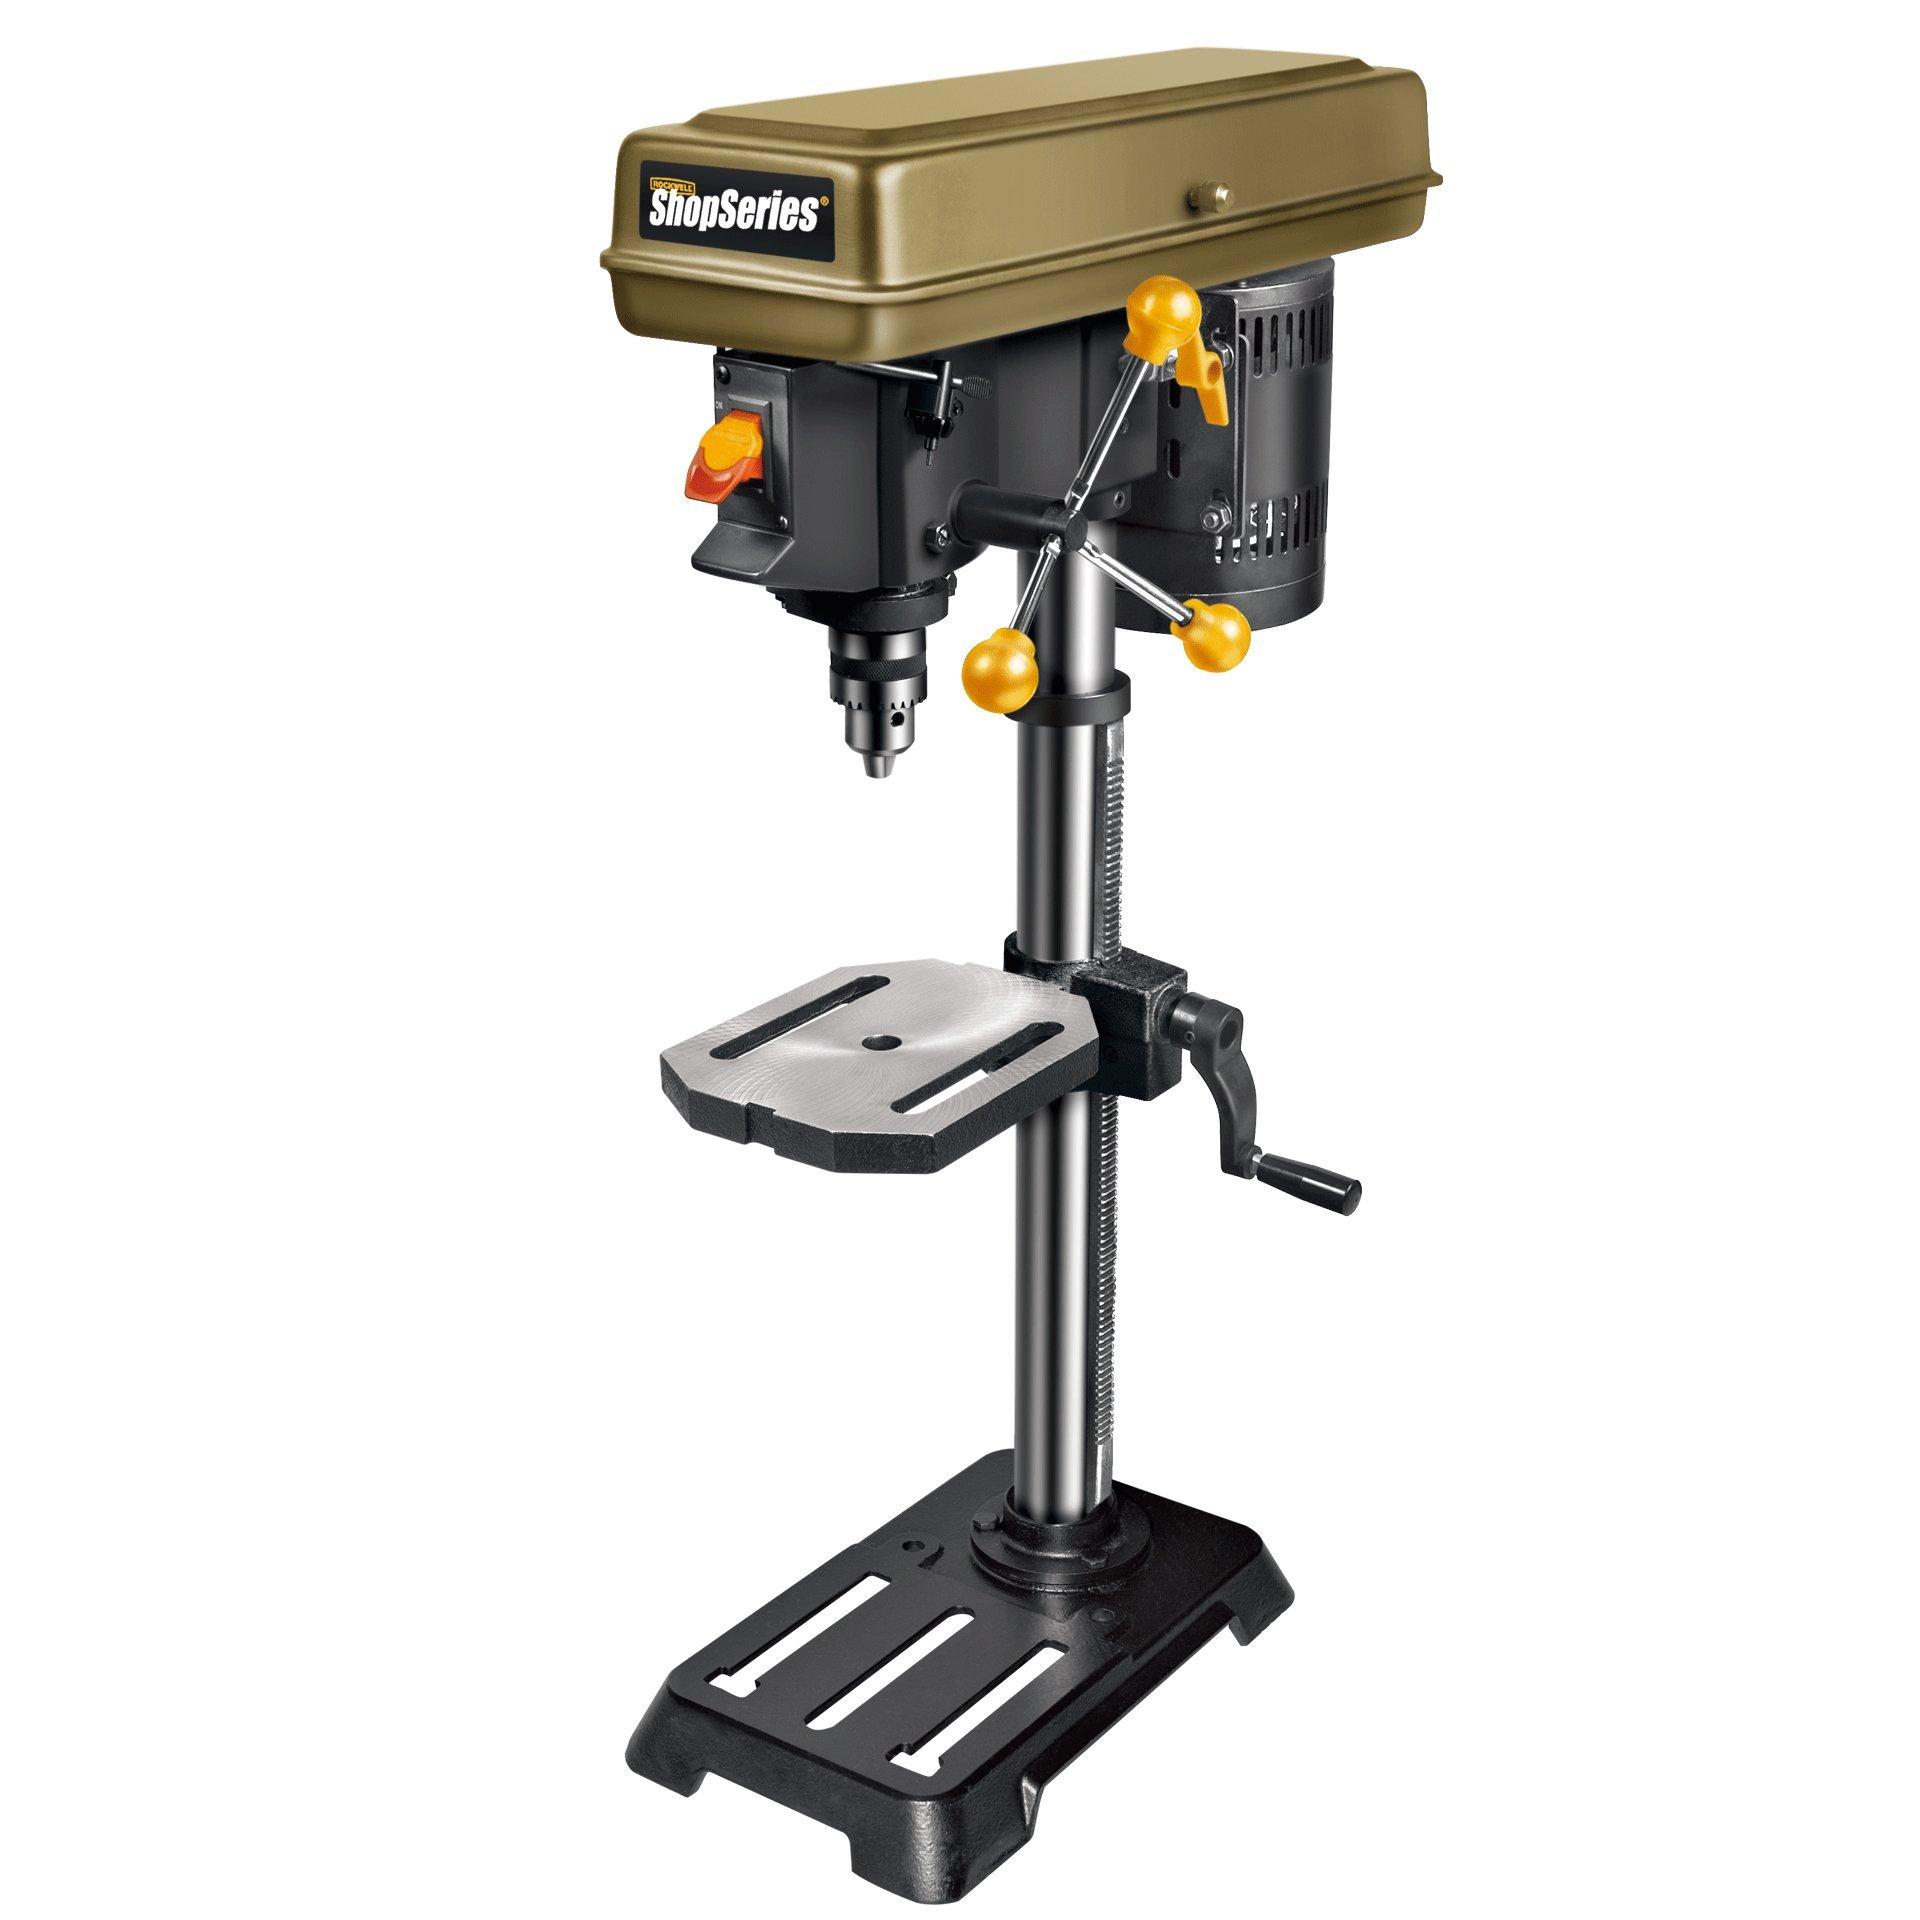 ShopSeries RK7033 6.2-Amp 10'' Drill Press